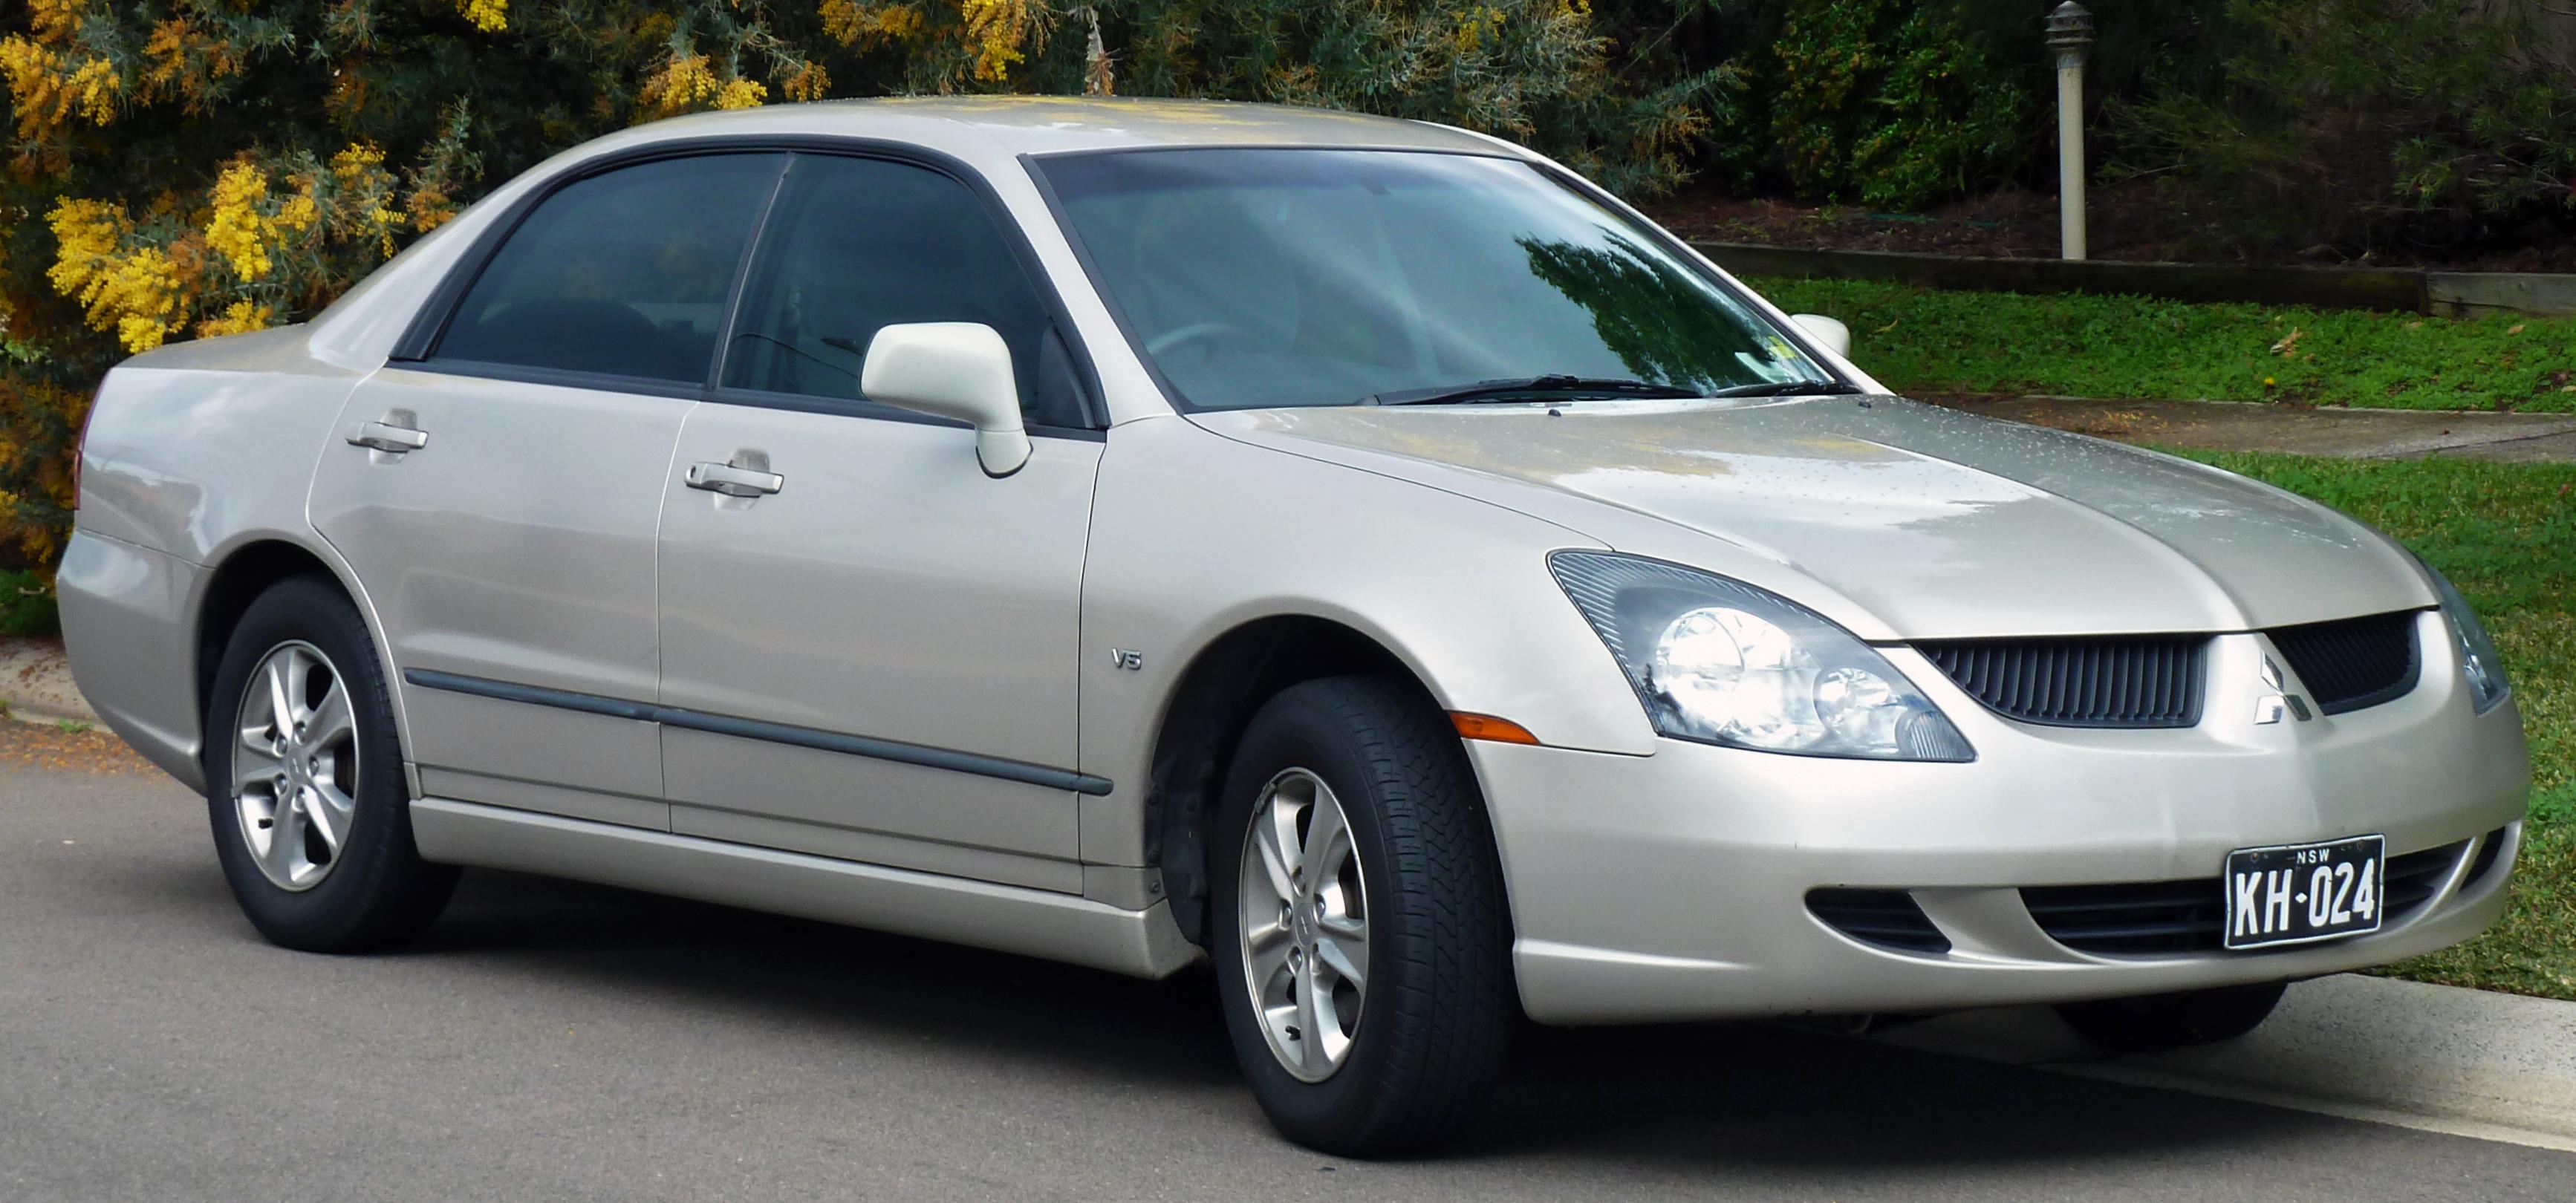 Mitsubishi magna 2004